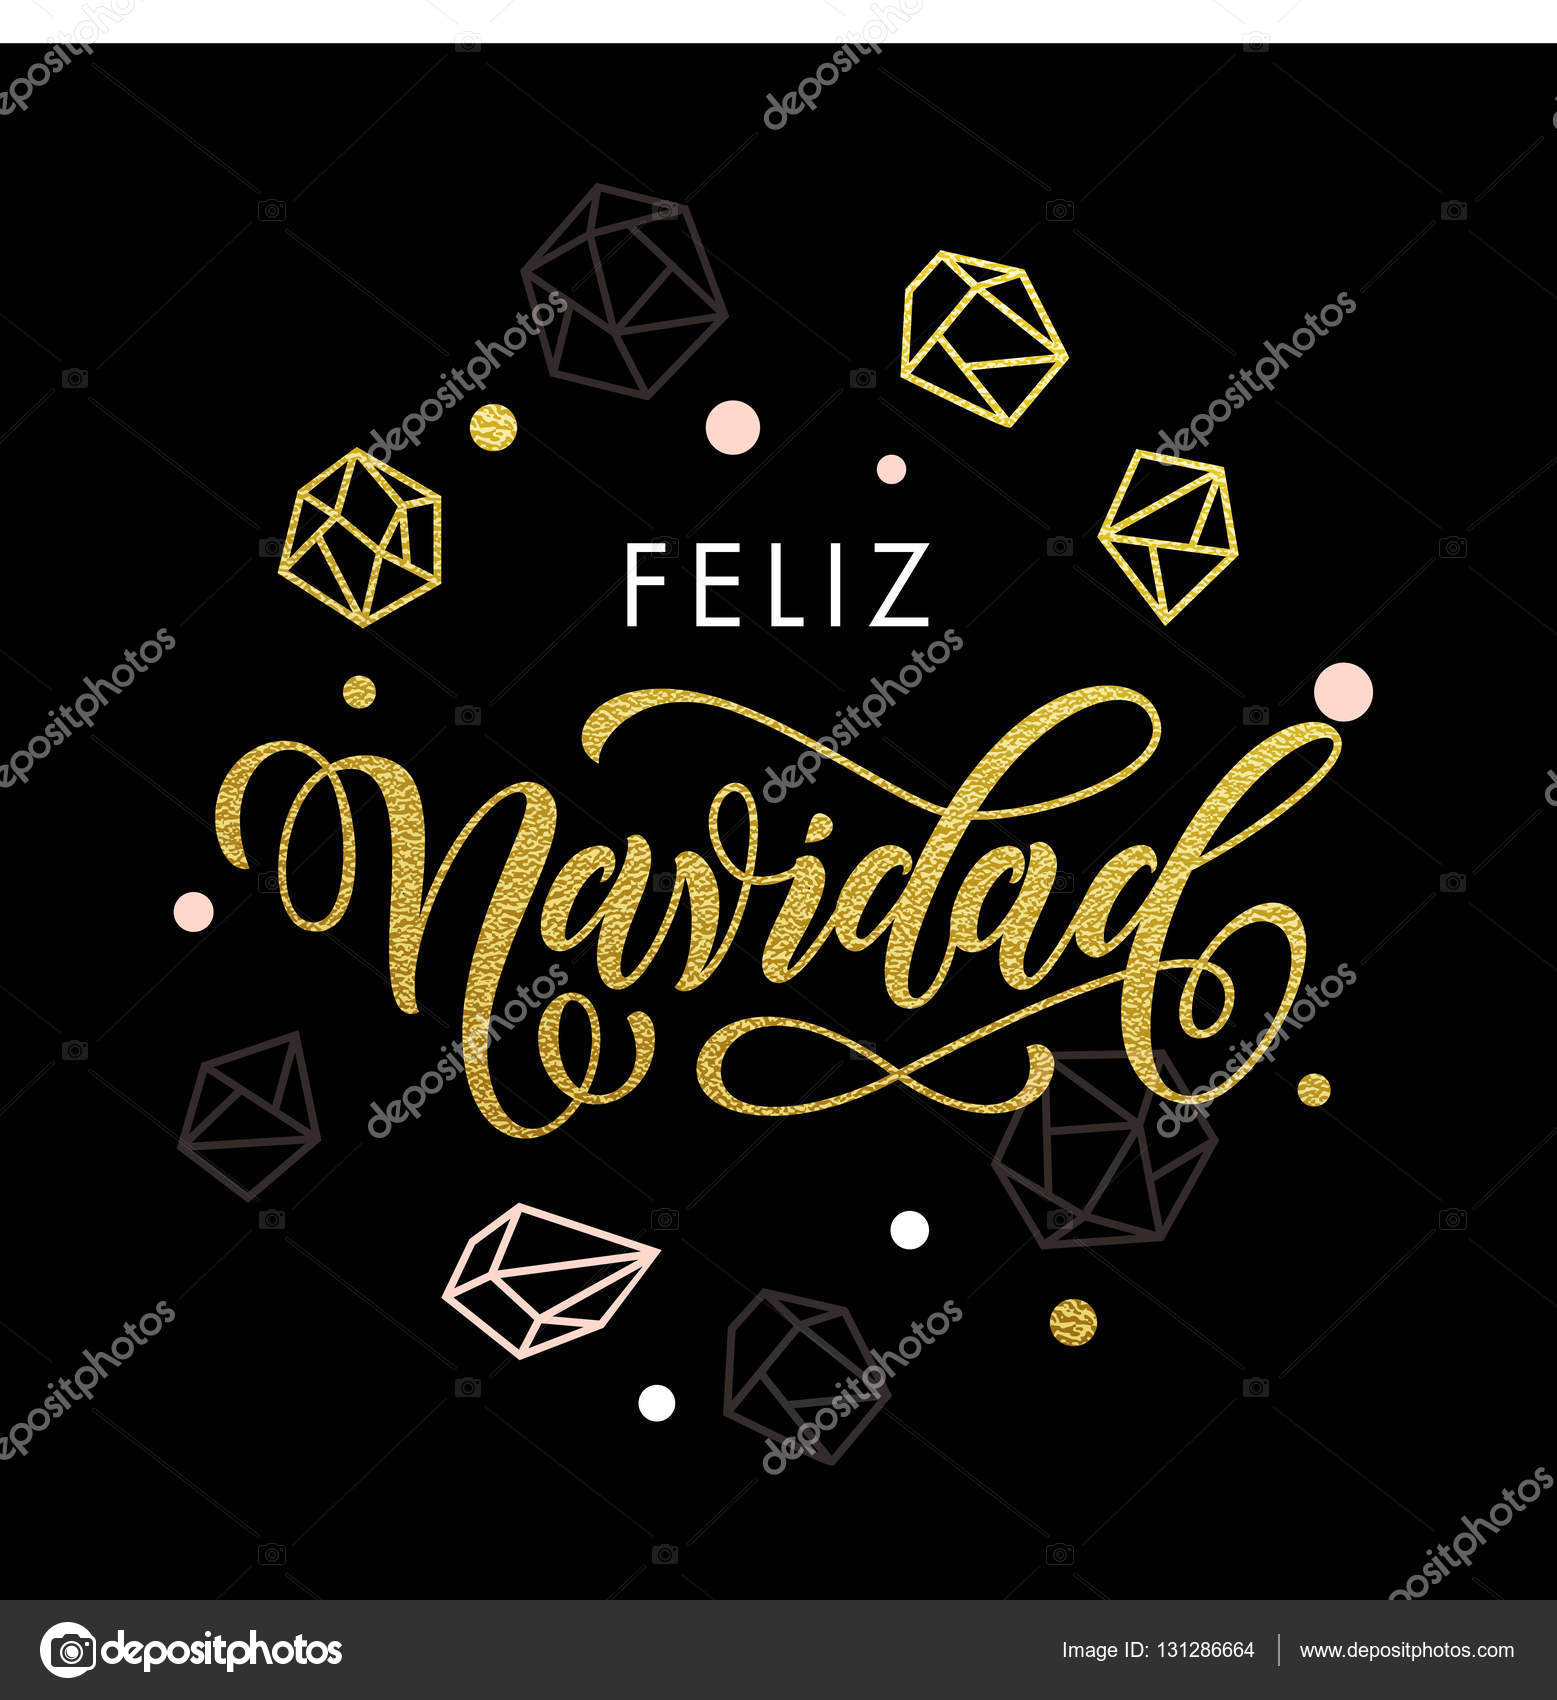 Merry Christmas Spanish Feliz Navidad greeting card — Stock Vector ...